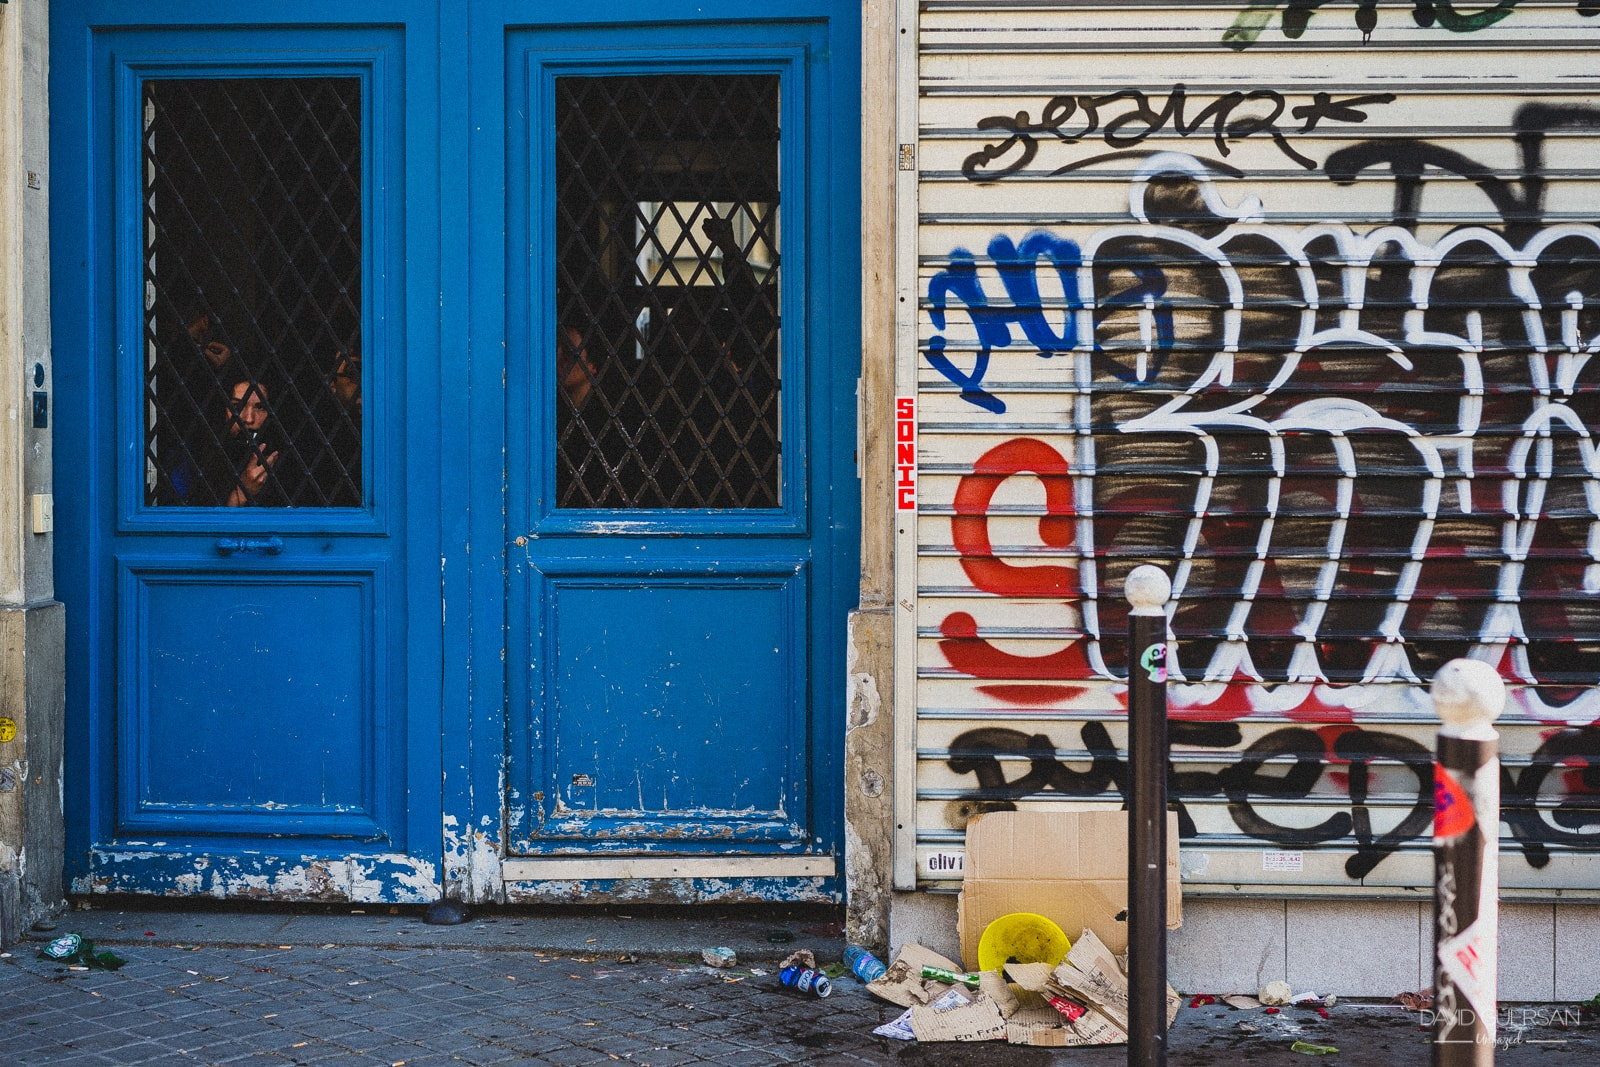 VX5A0452- Paris Manifestation 1er Mai 2016 -David Guersan-min.jpg